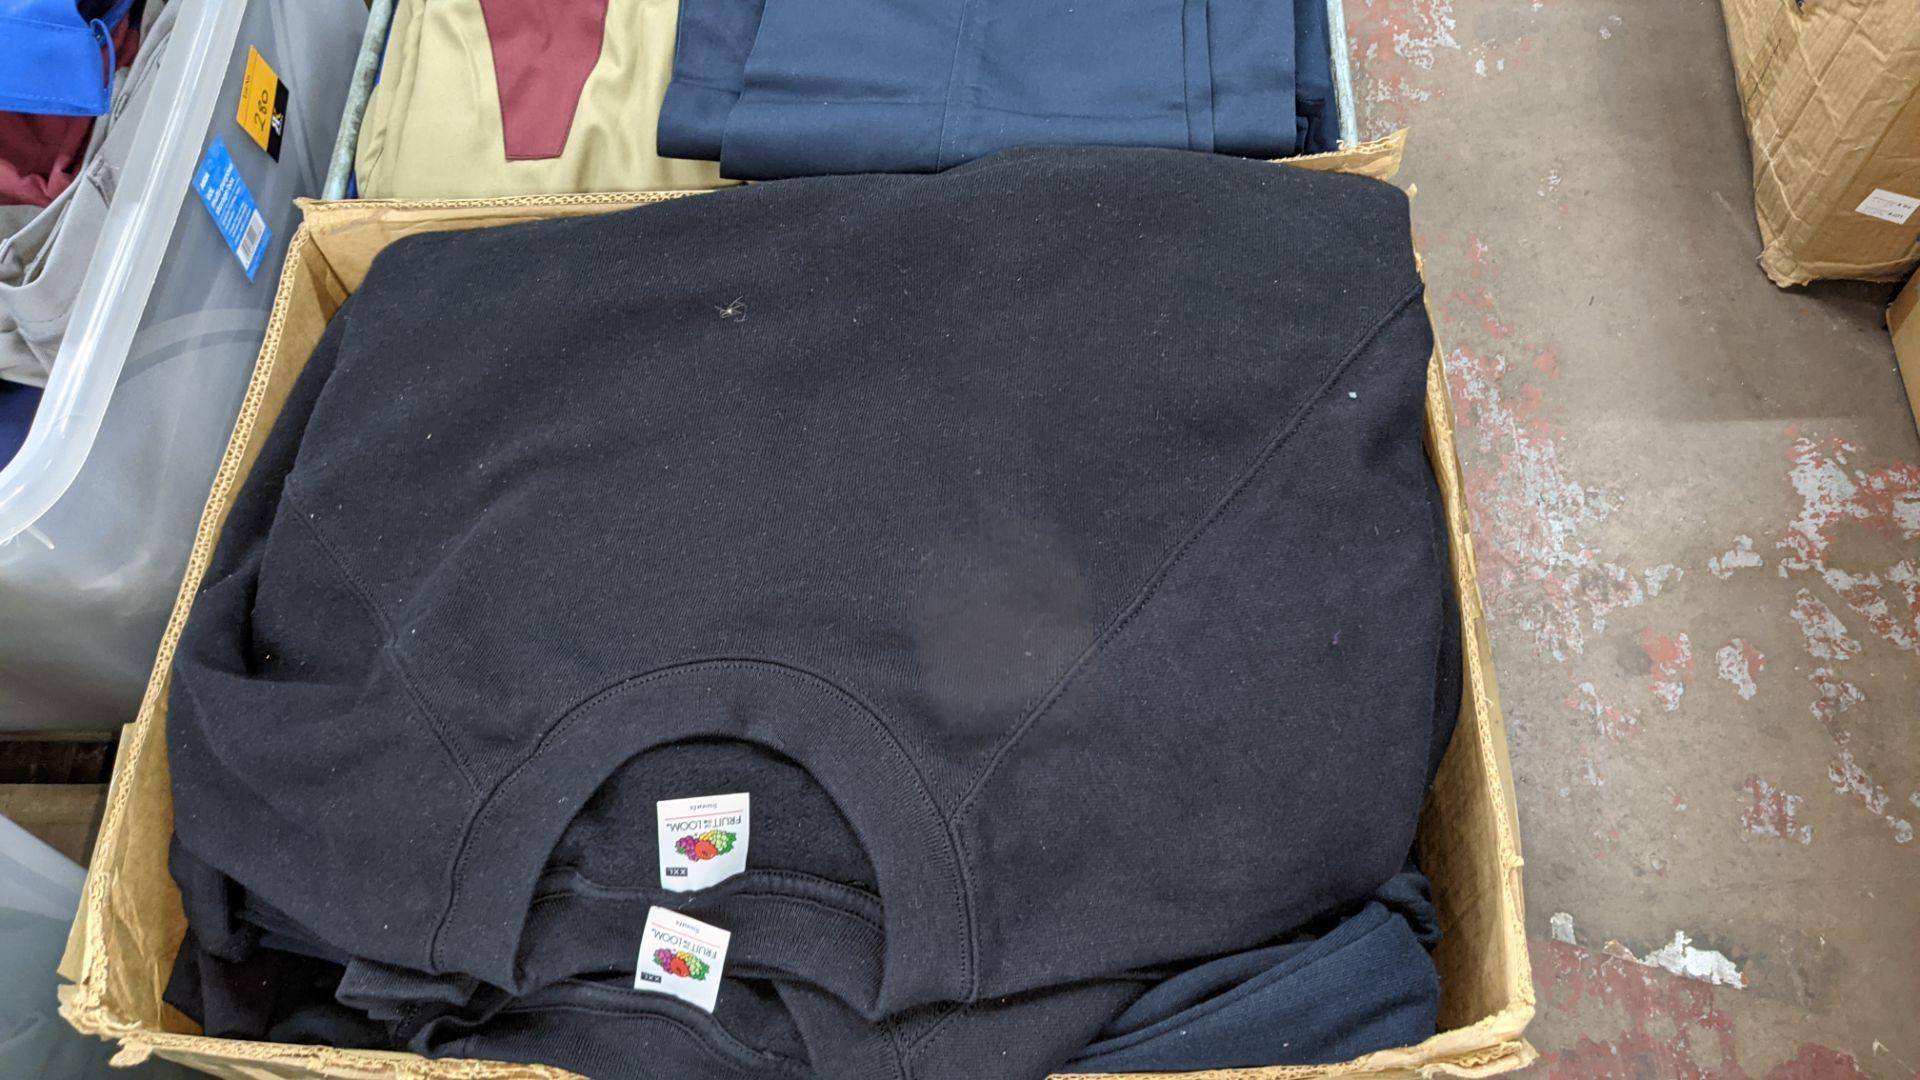 Quantity of black sweatshirts - 1 large box - Image 3 of 4